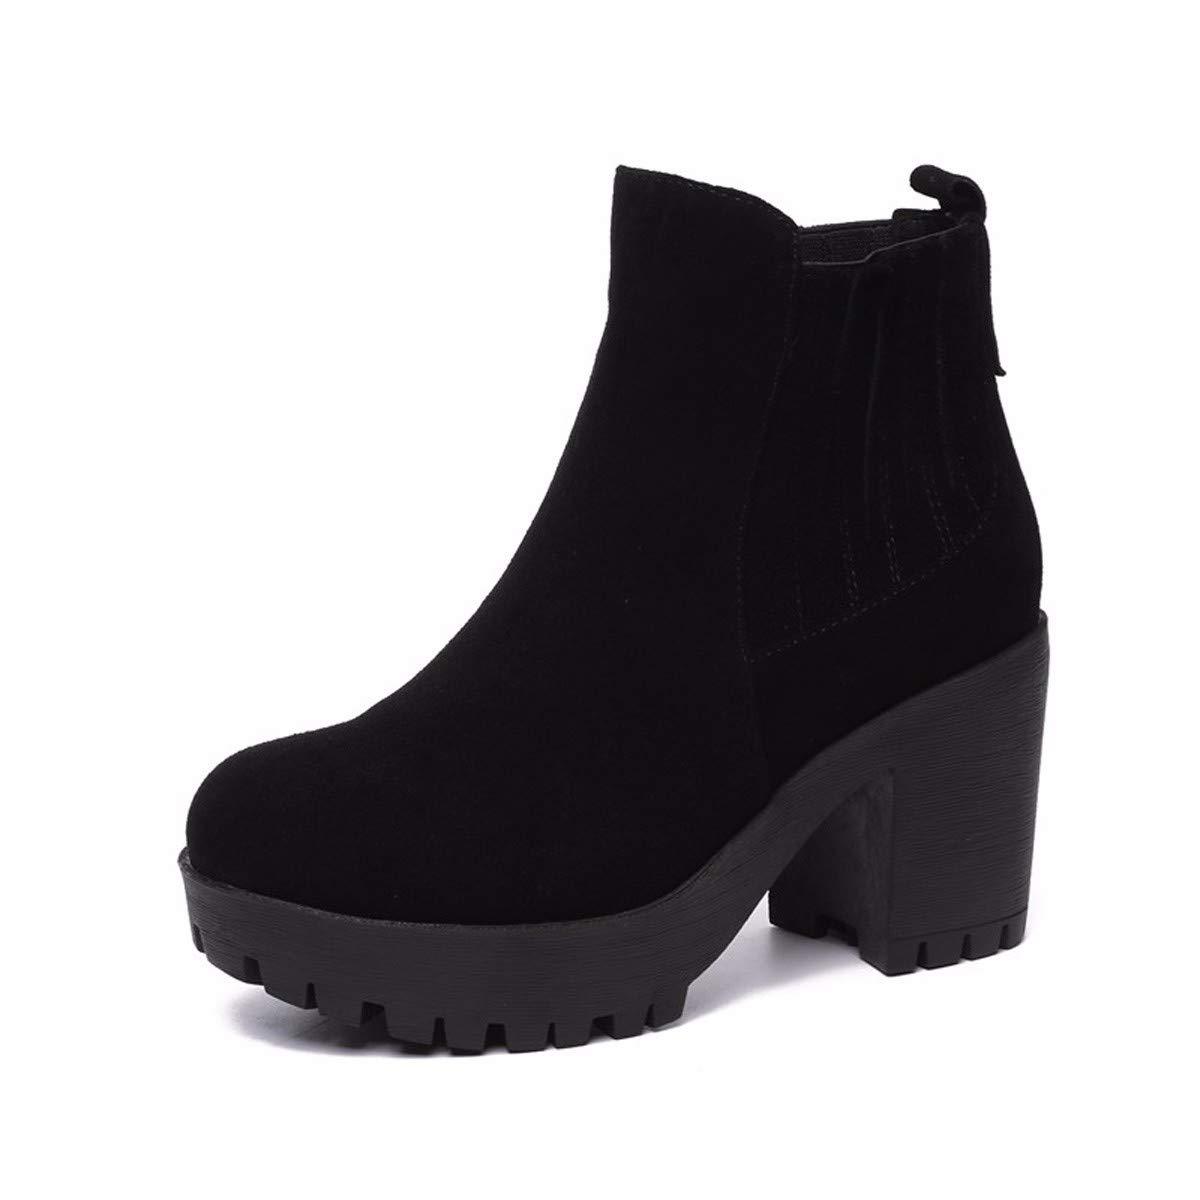 KHSKX 10Cm High Heel Shoes Woman Chelsea Boots Winter Martin